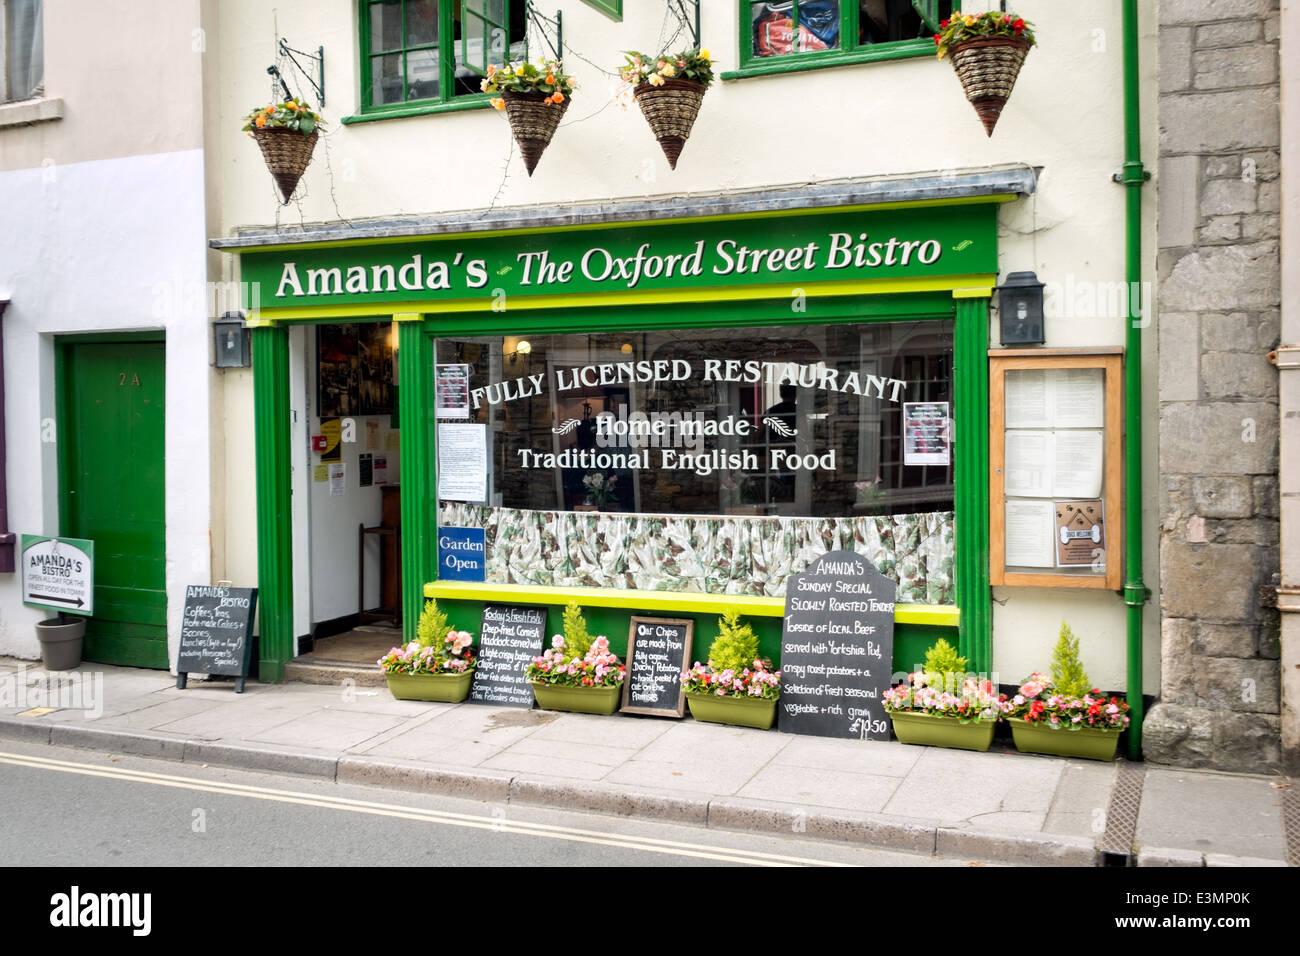 Amanda's bistro in Oxford Street, Malmesbury, Wiltshire, on a sunny day - Stock Image